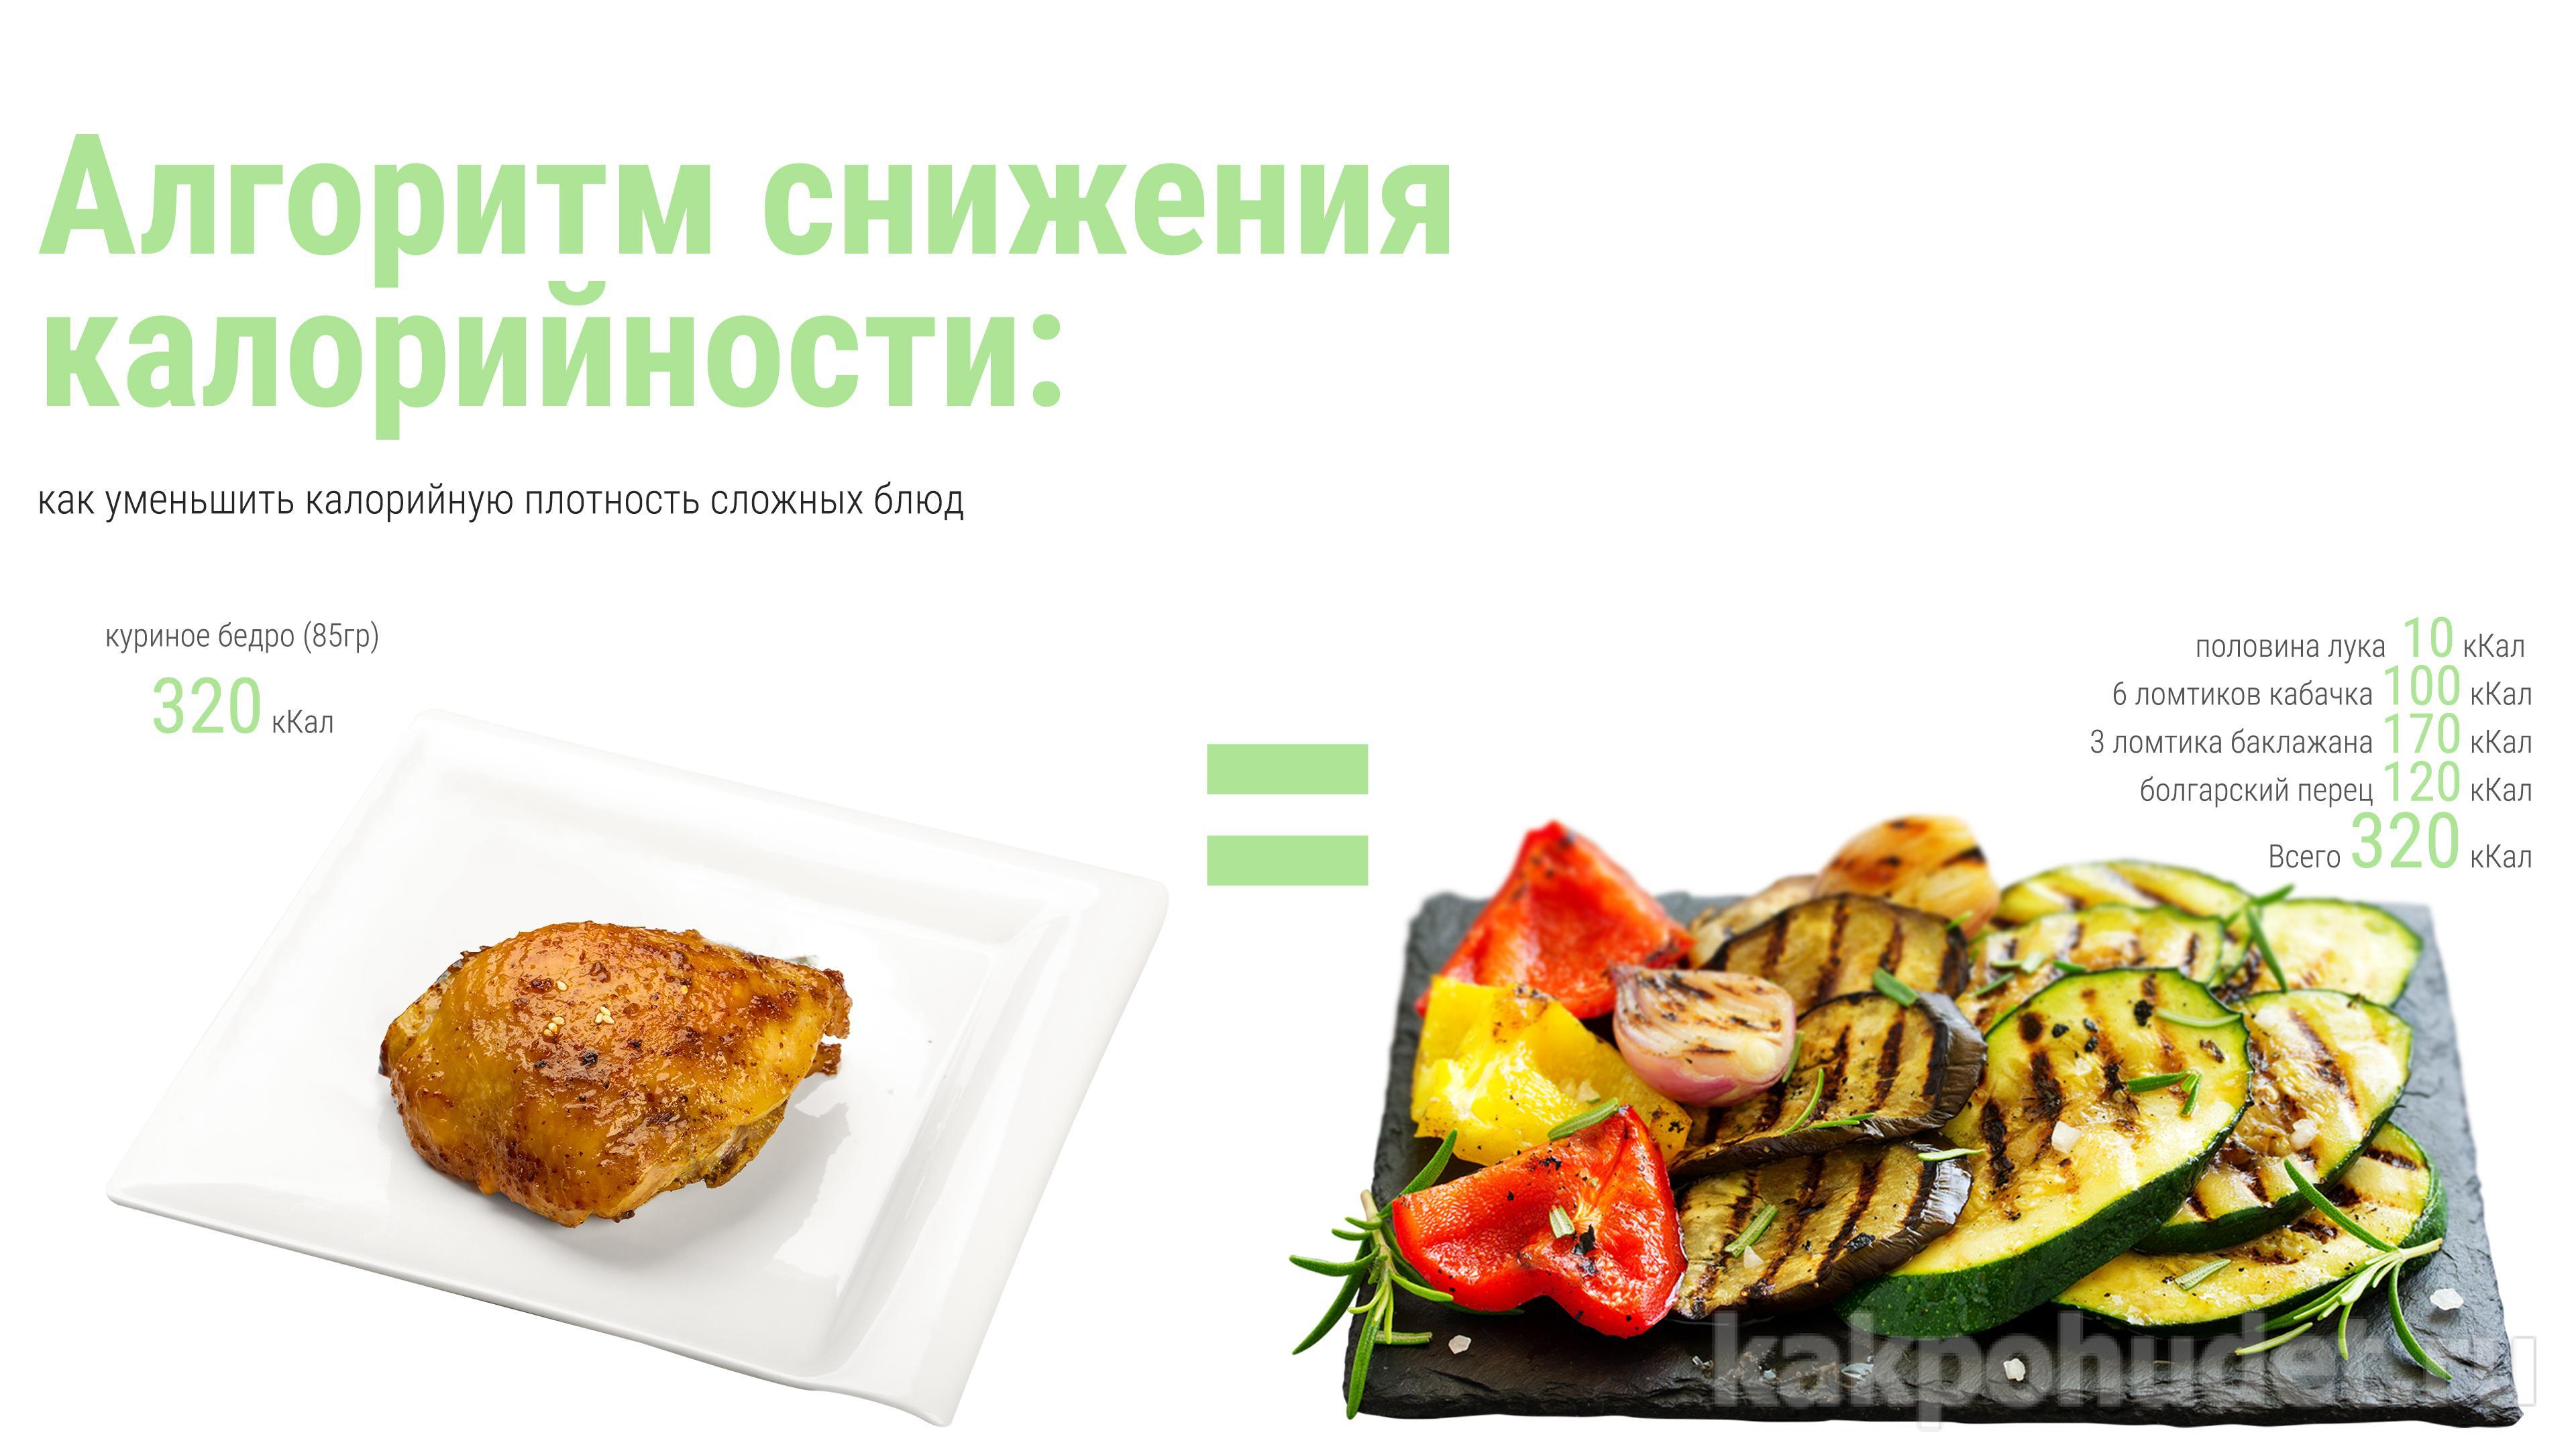 алгоритм снижения калорийности